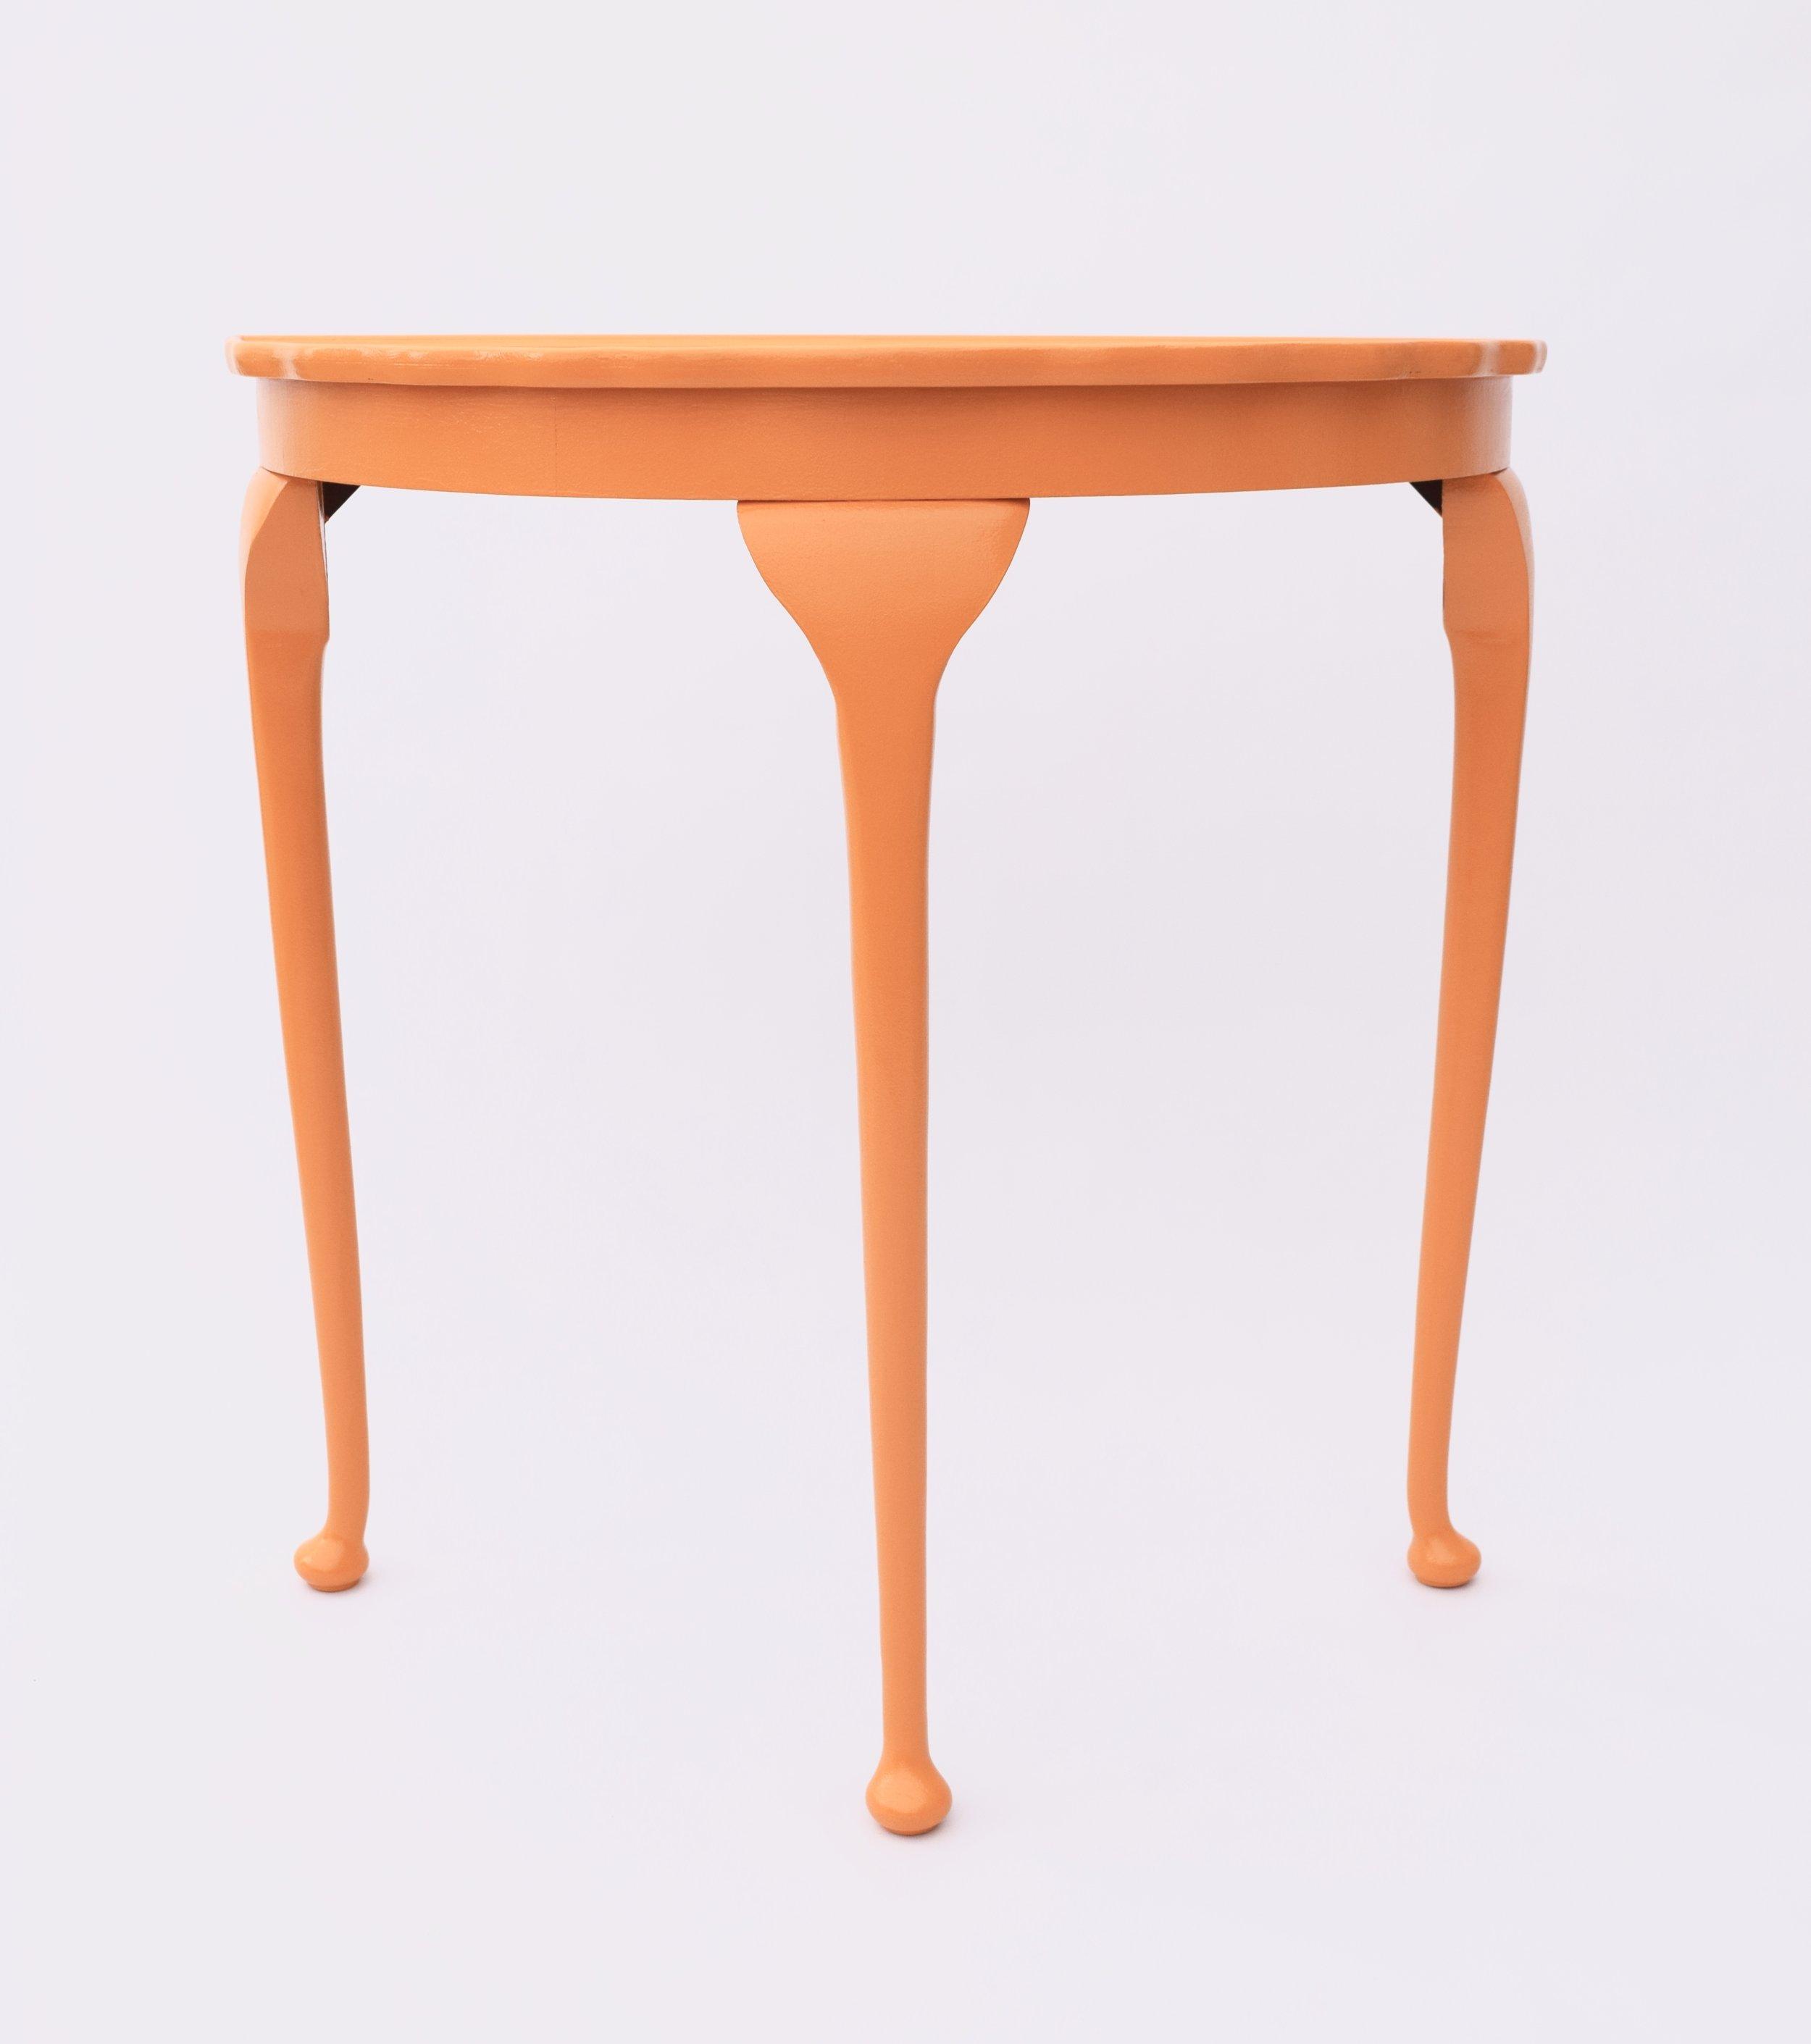 ORANGE DEMI-LUNE TABLE